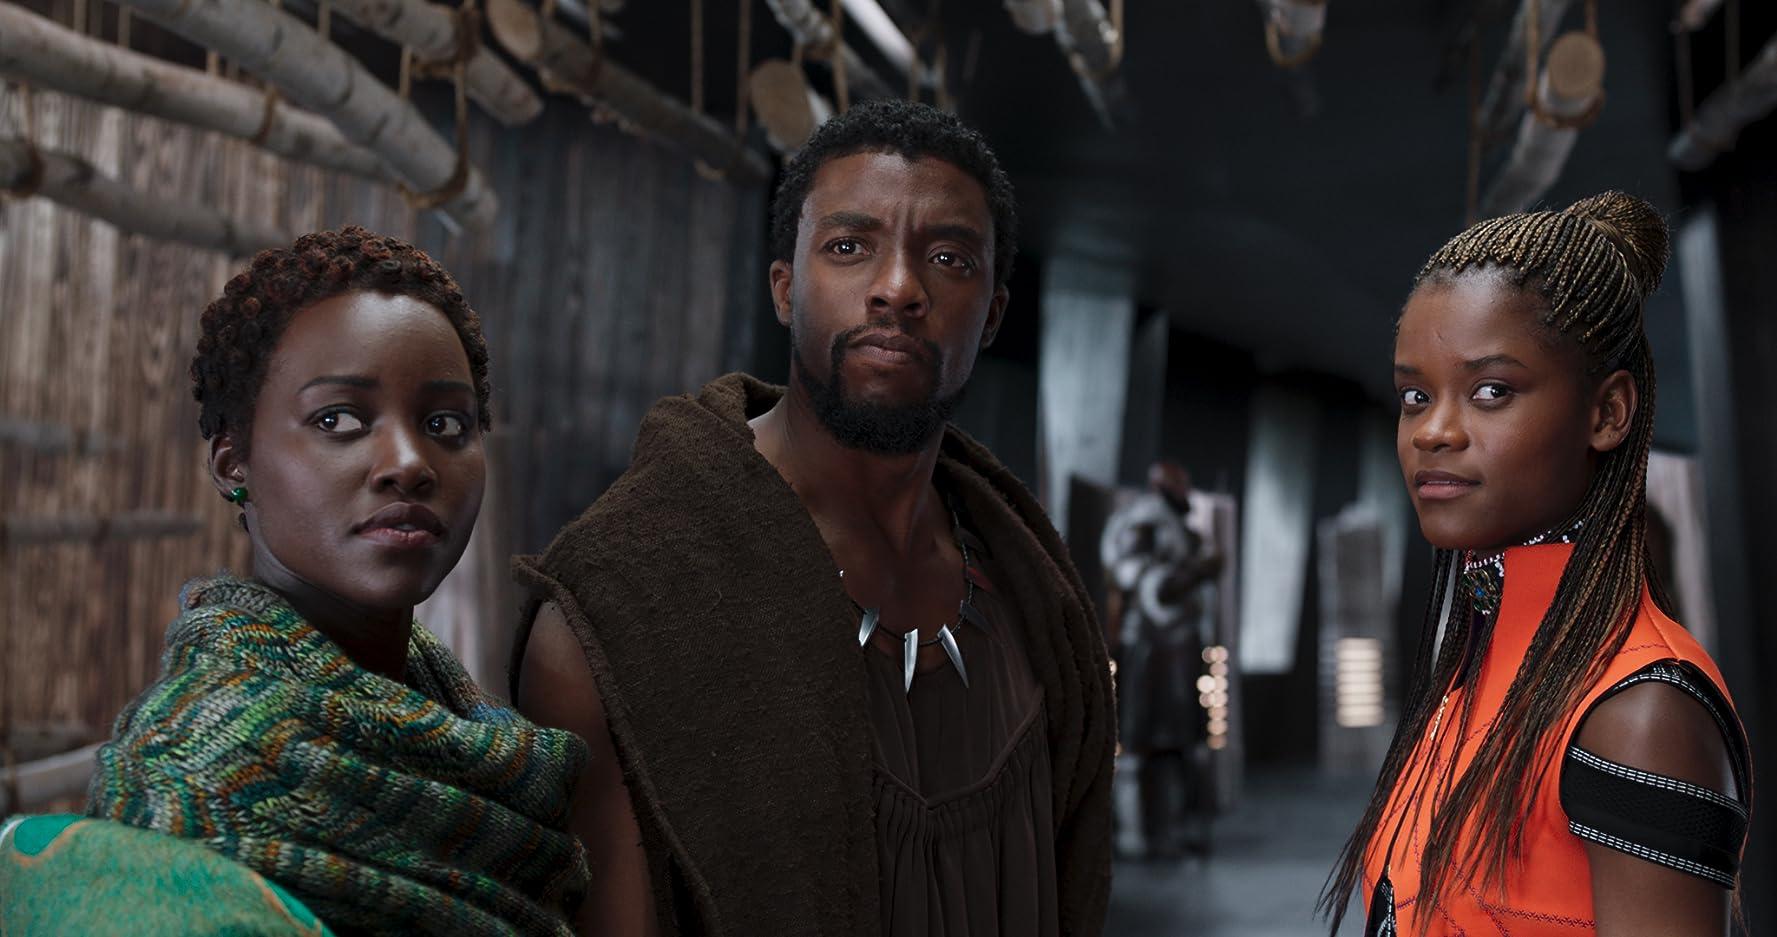 Chadwick Boseman, Lupita Nyong'o, and Letitia Wright in Black Panther (2018)